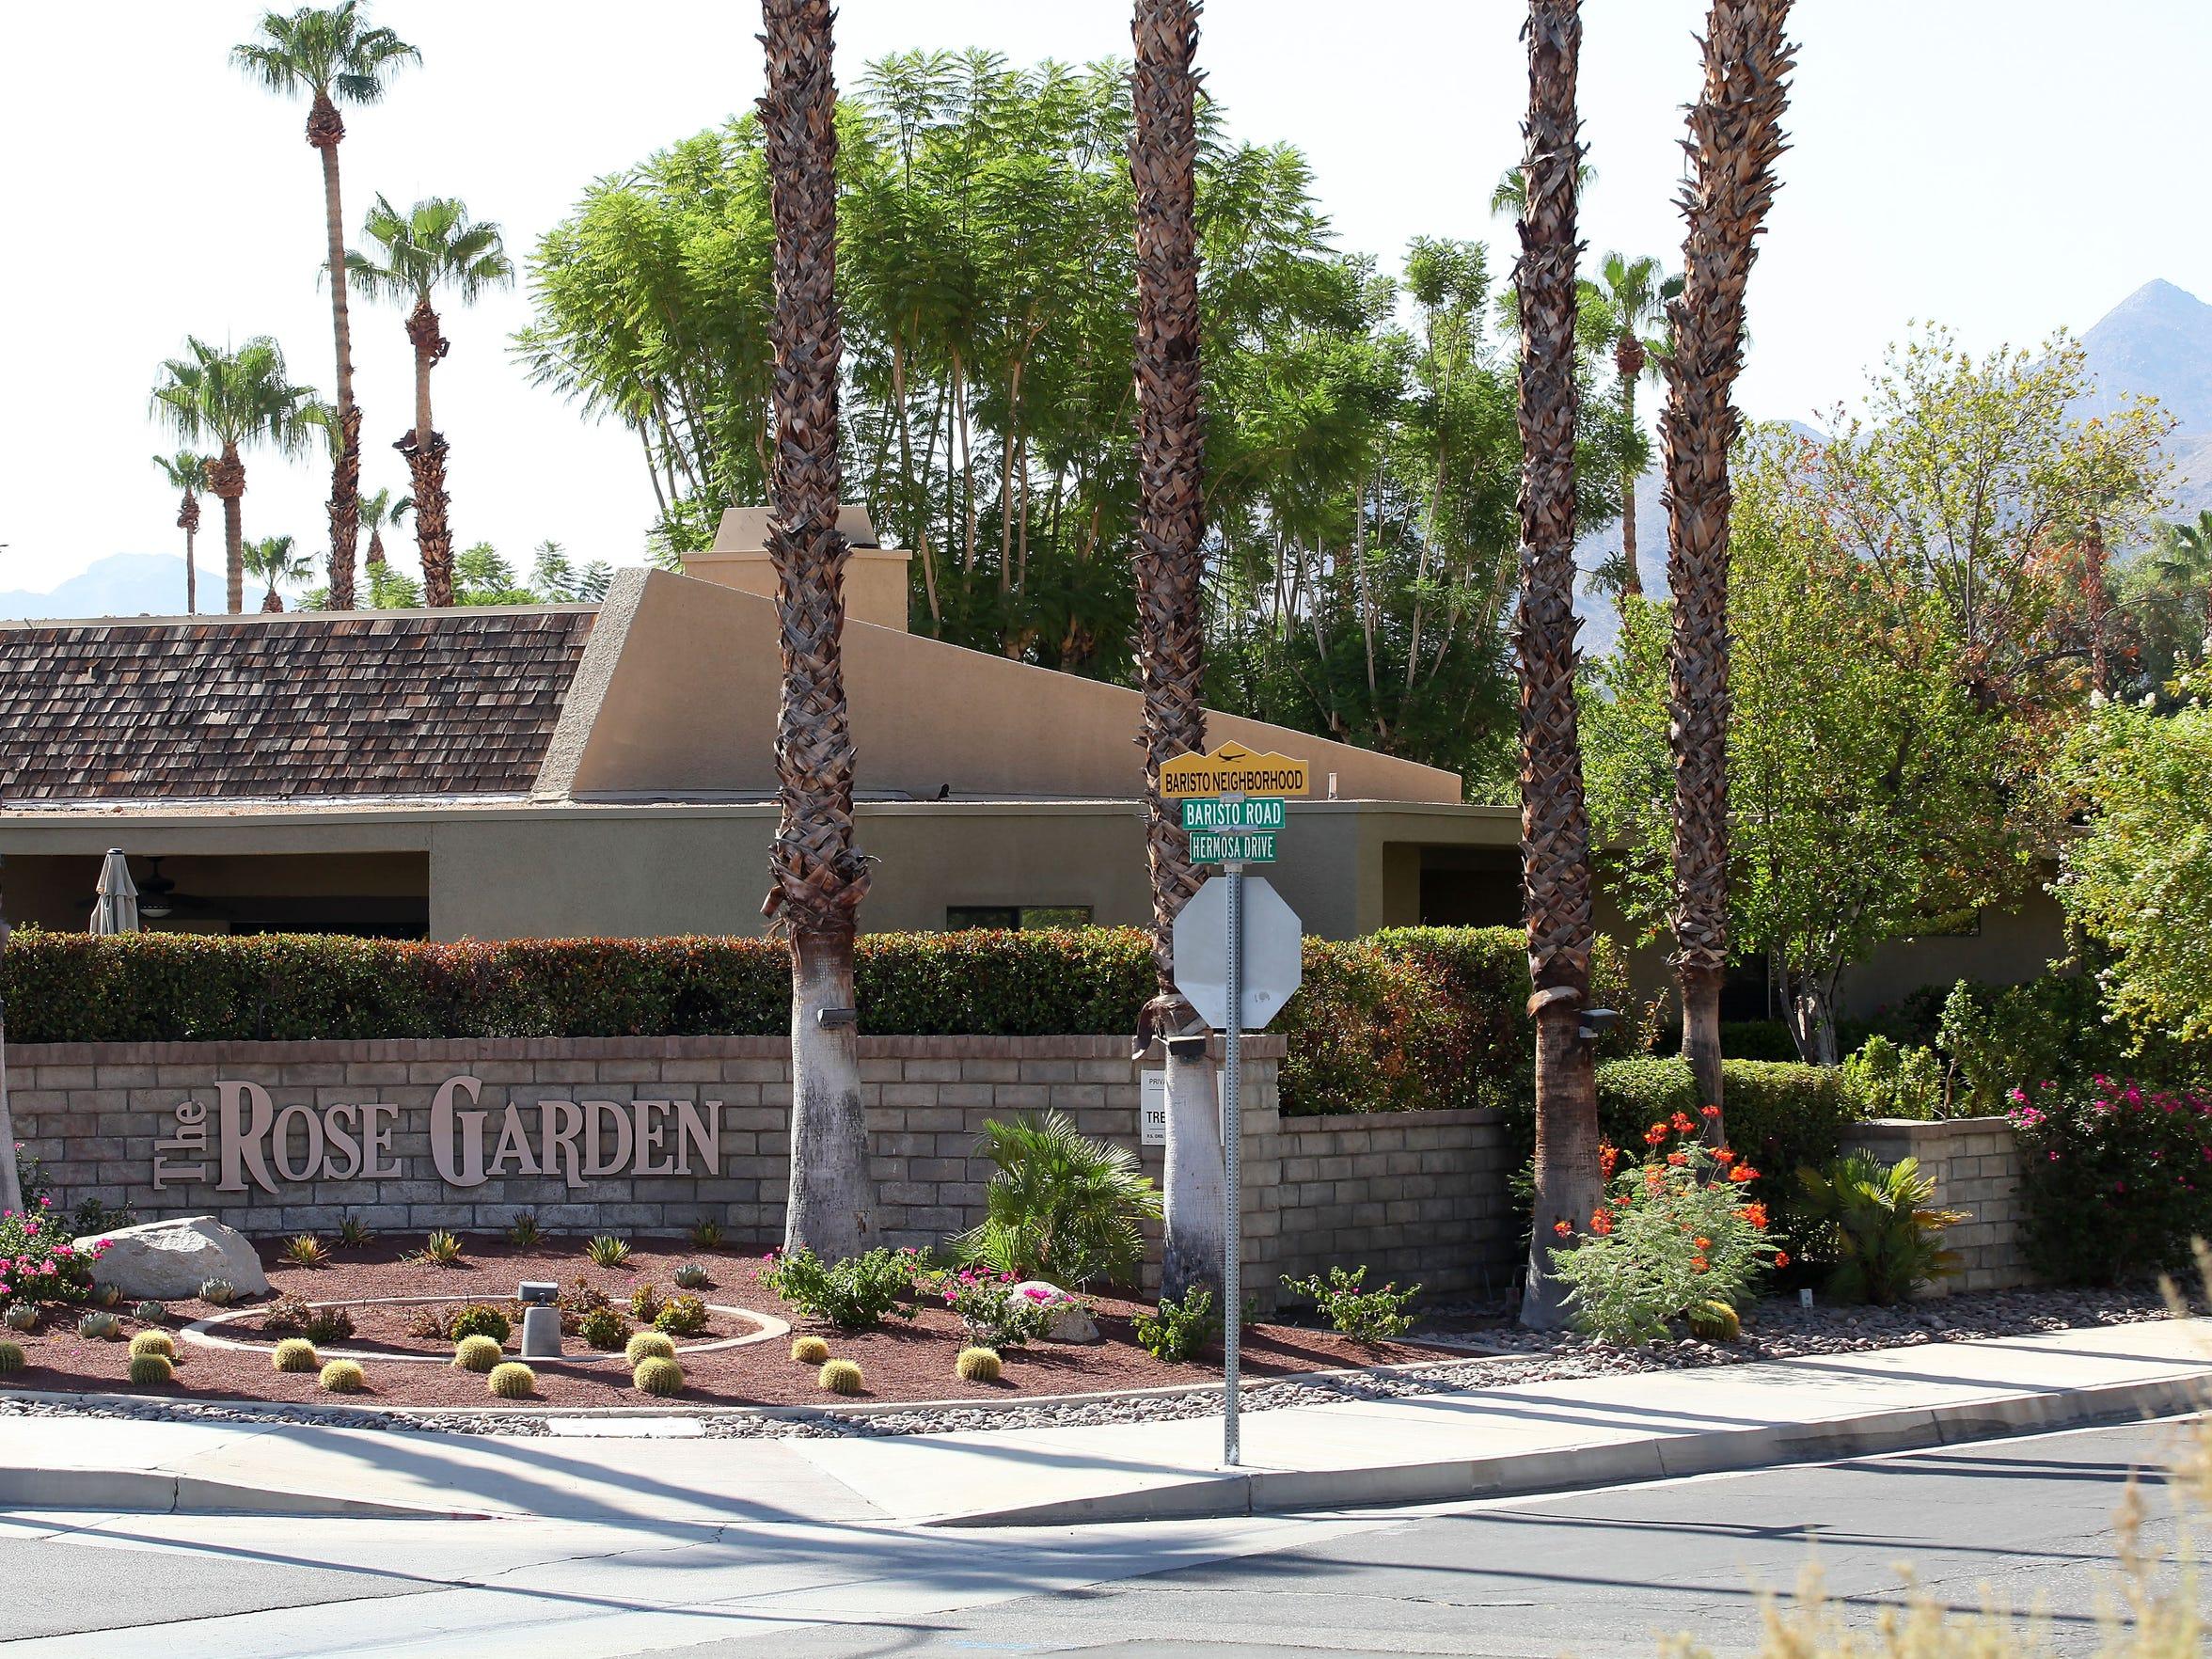 The Rose Garden neighborhood in Palm Springs at Baristo